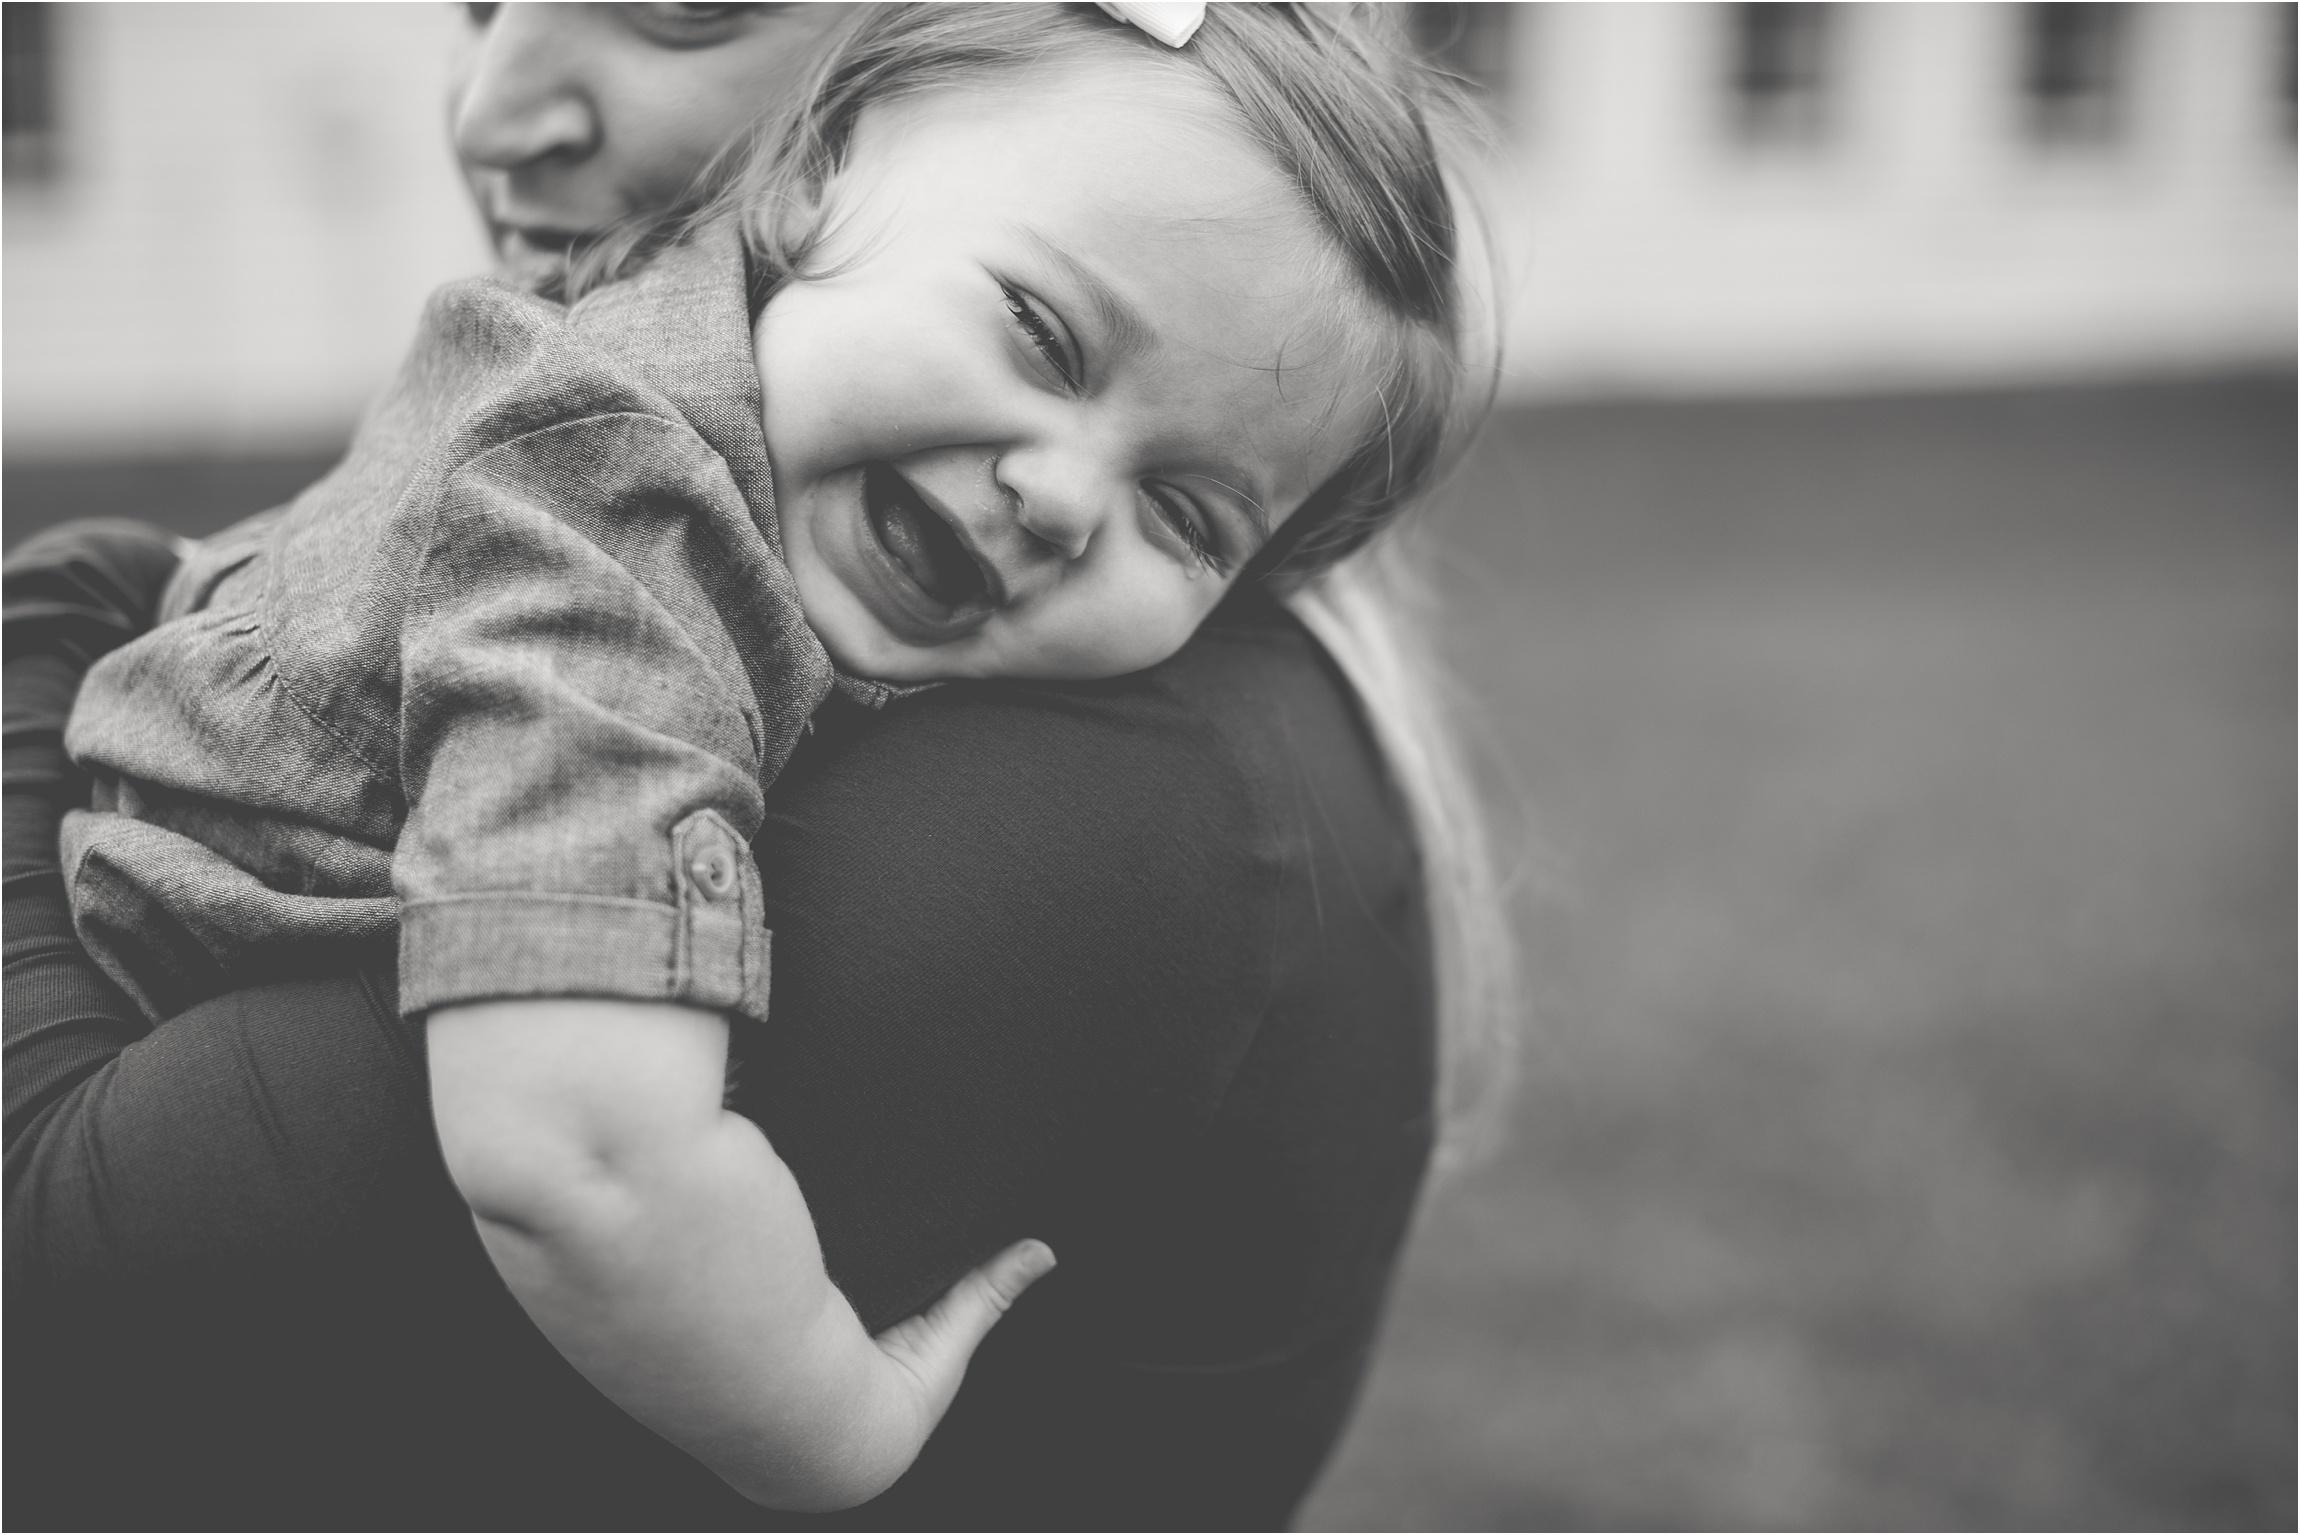 toddlercrying.documentaryphotography